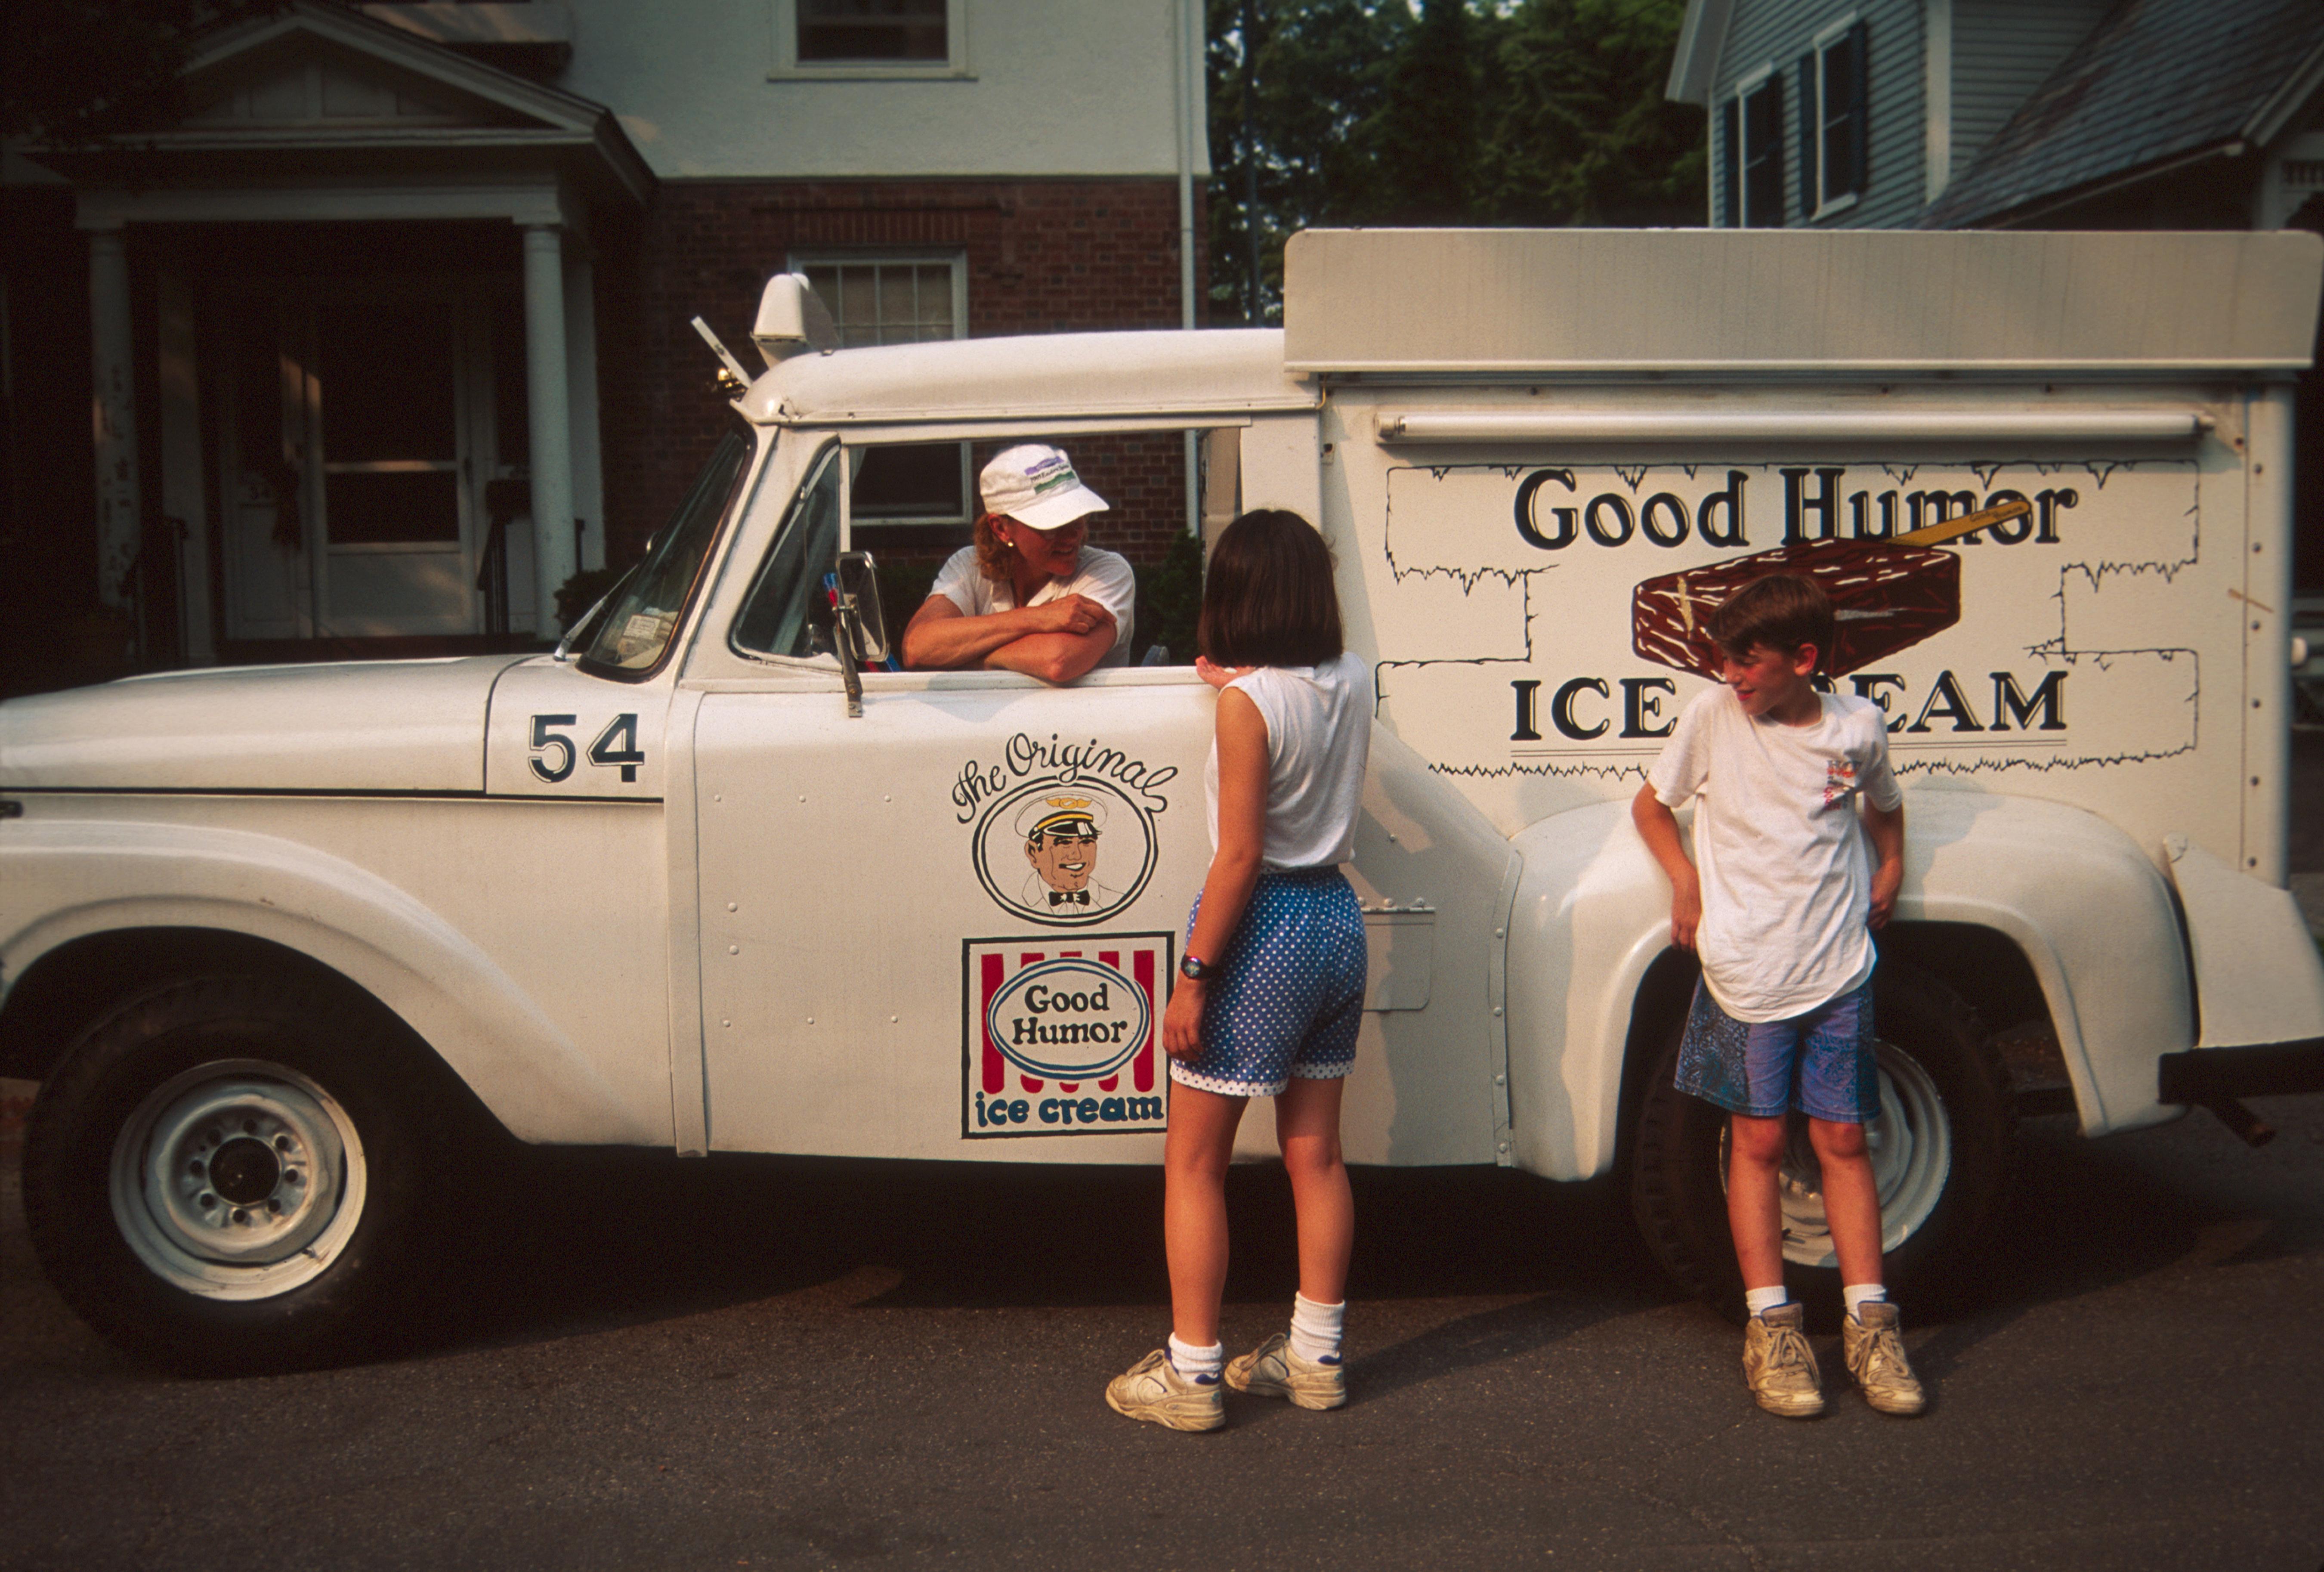 A Good Humor ice cream truck.